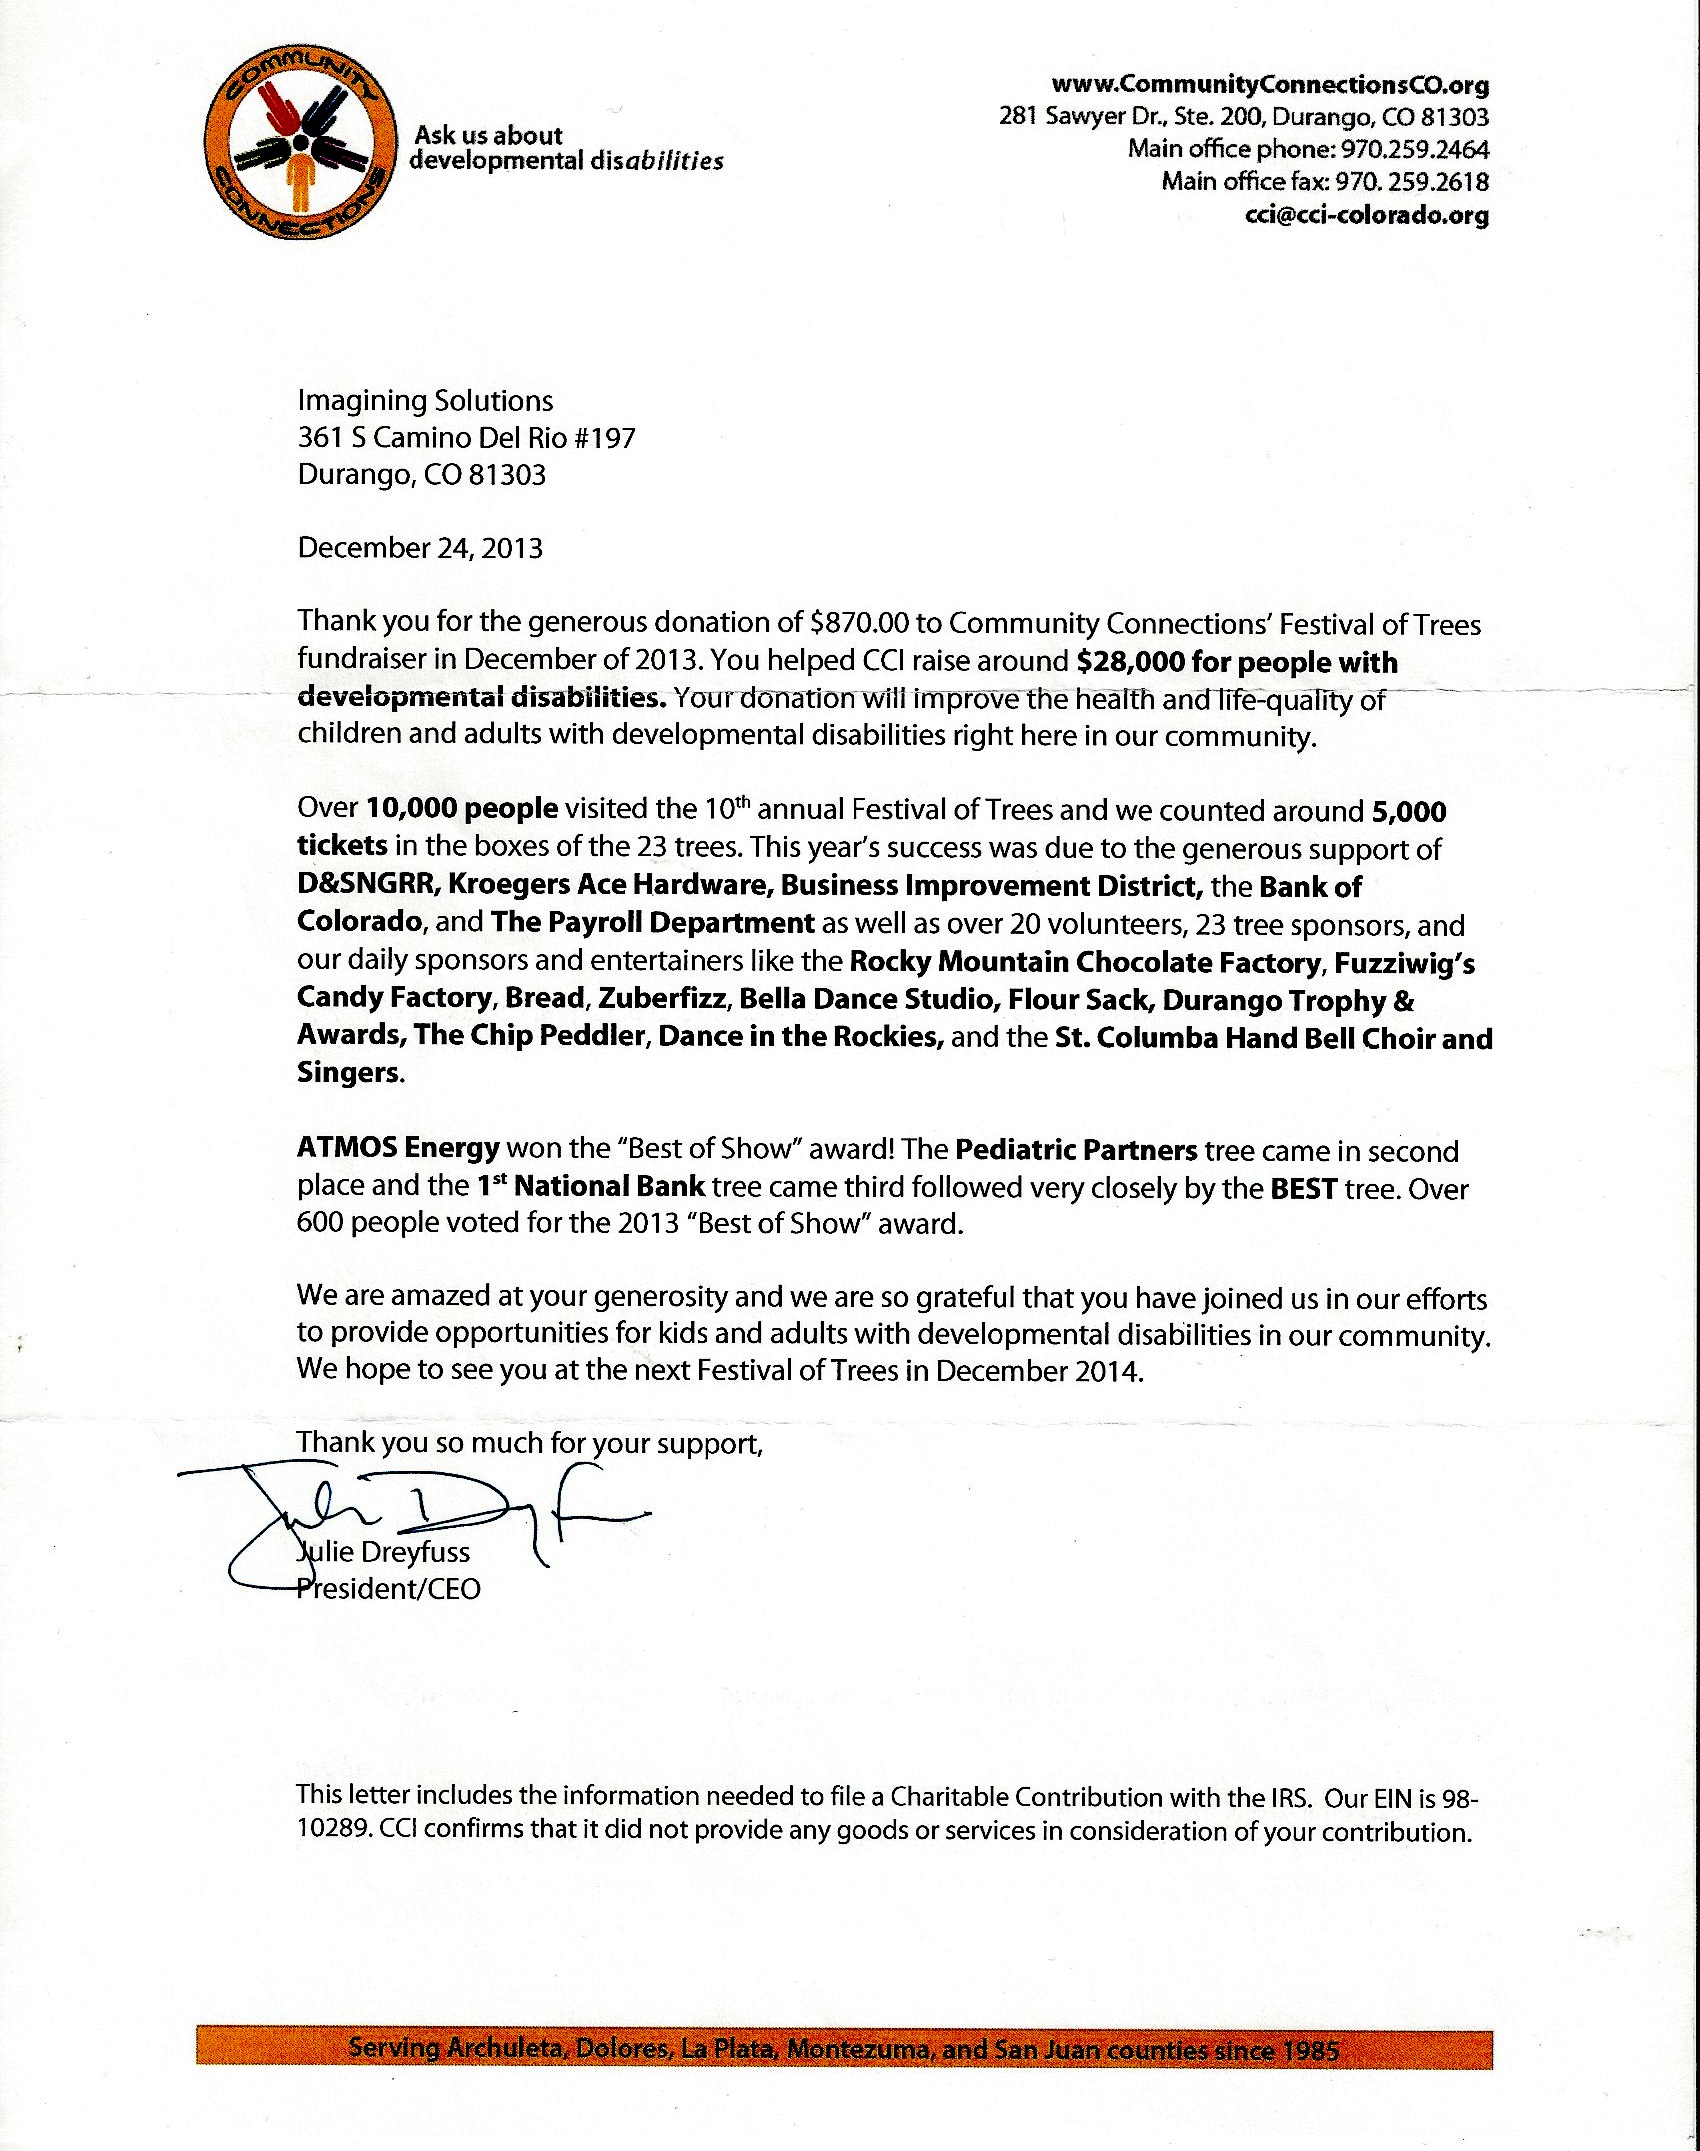 Letter from CC.jpg